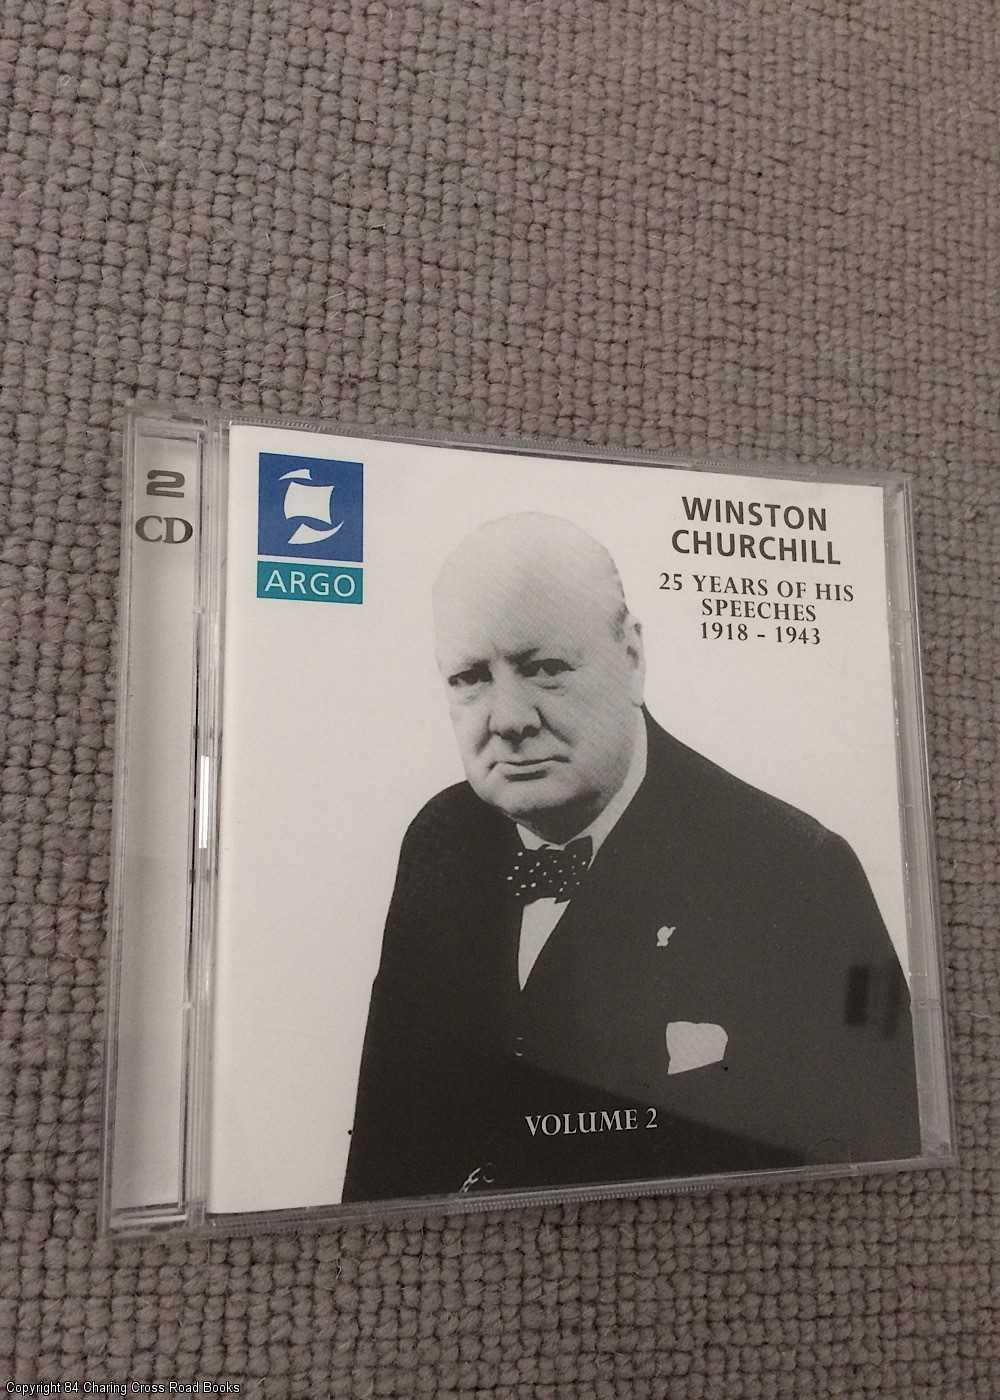 25 Yrs Of Speeches 1918 - 1943: Winston Churchill